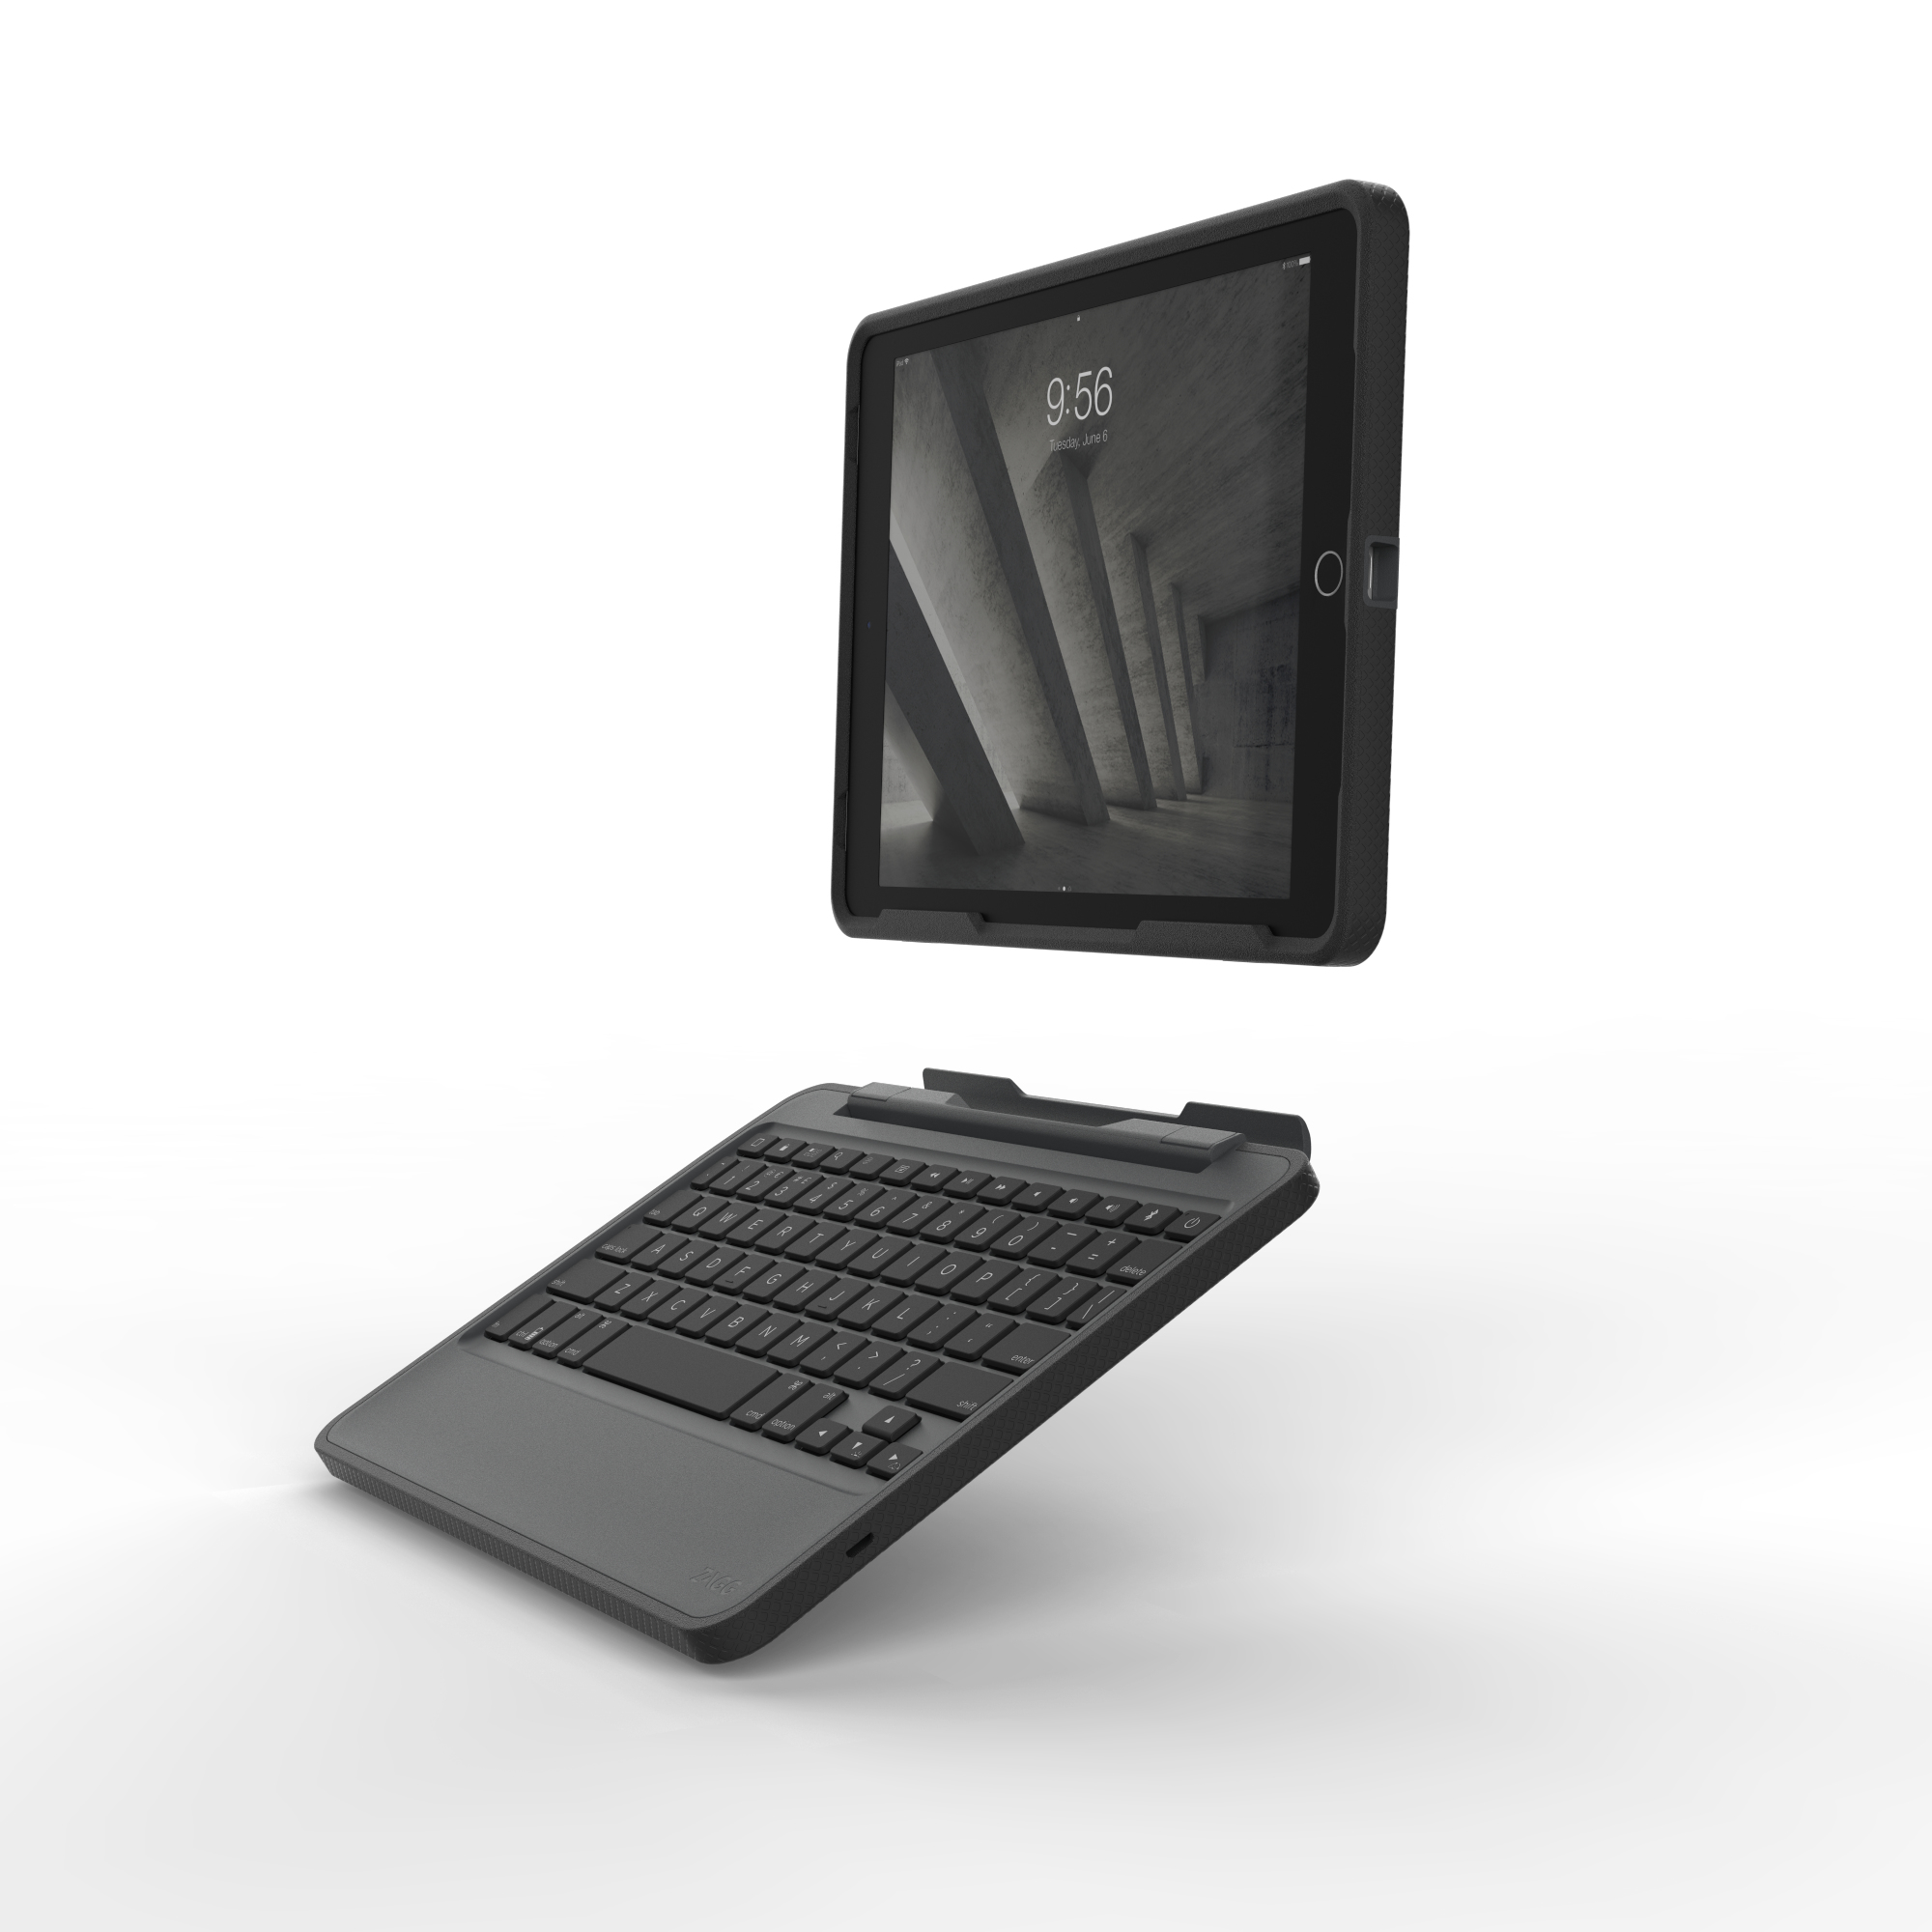 ZAGG Rugged Book toetsenbord voor mobiel apparaat AZERTY Frans Zwart